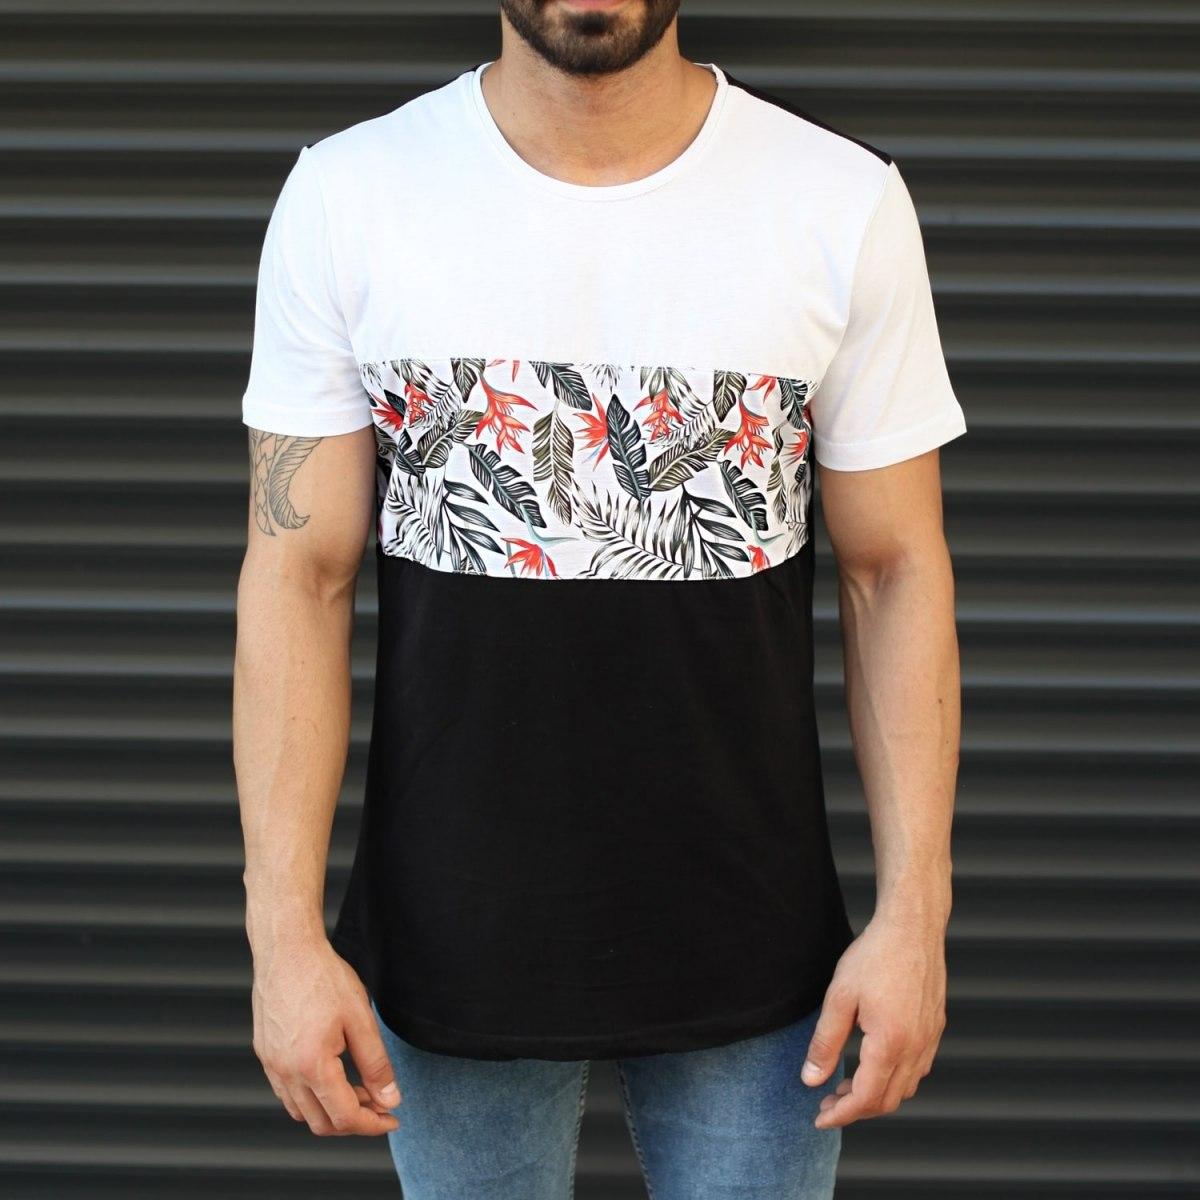 Men's Leaf Pattern Colorful T-Shirt Black & White Mv Premium Brand - 2